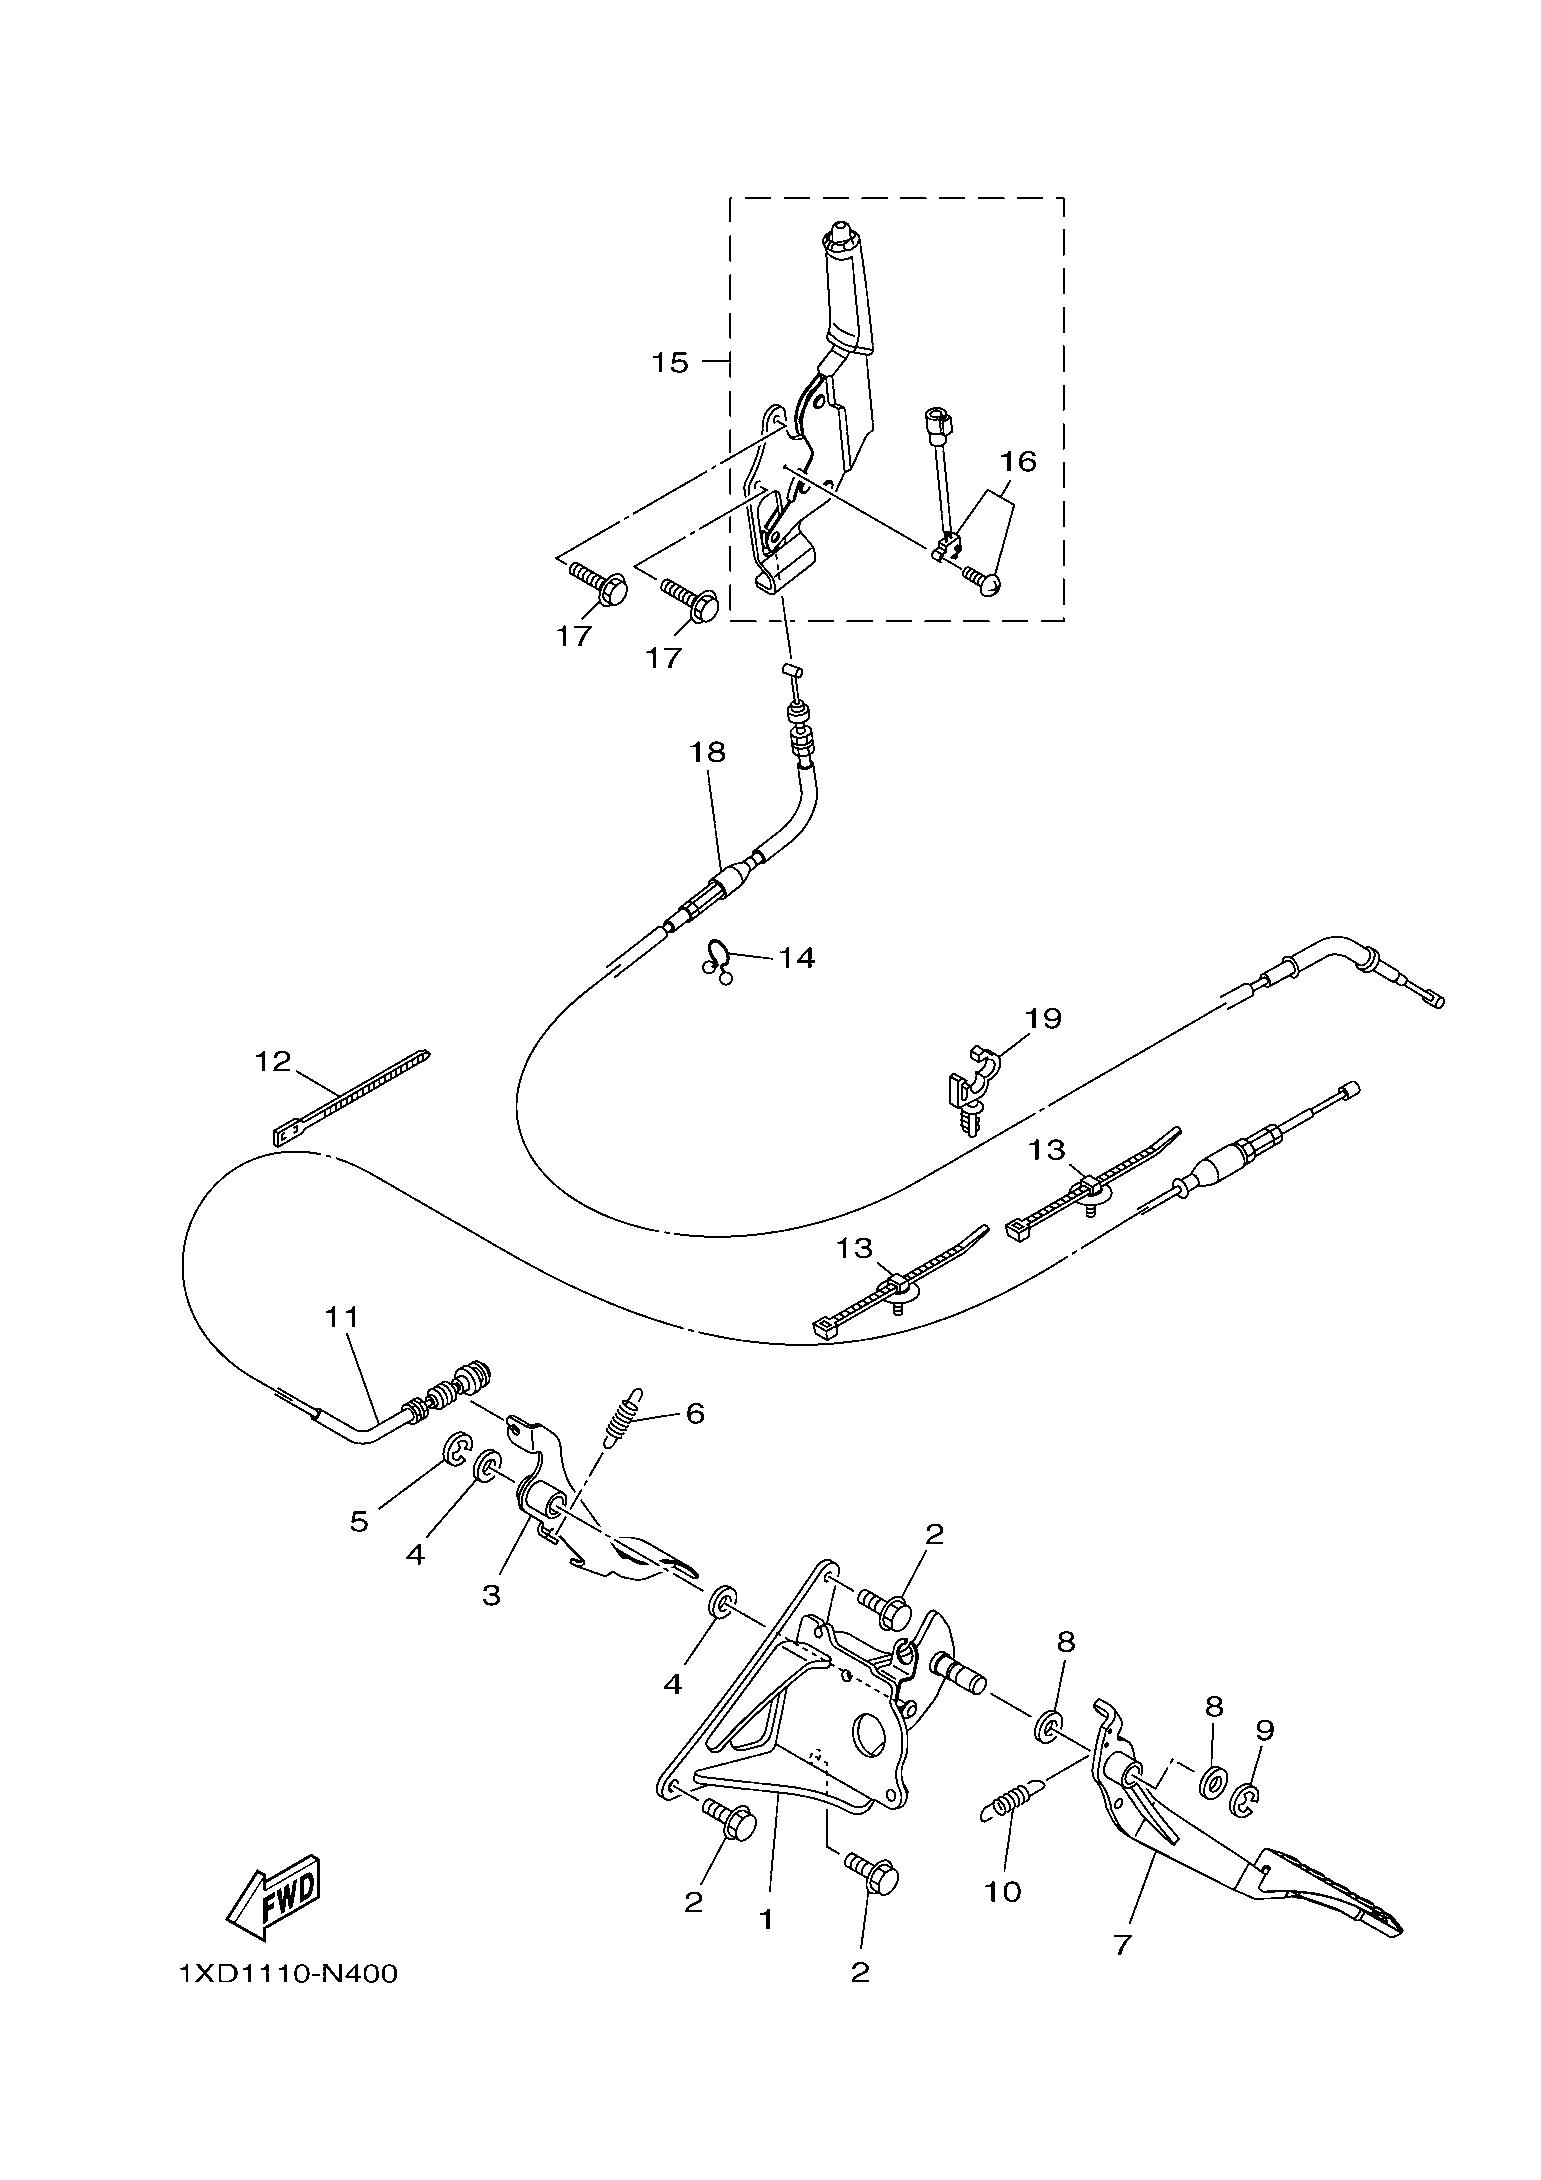 Yamaha Diagram Viking Wiring Yxm700pse Diagrams Library